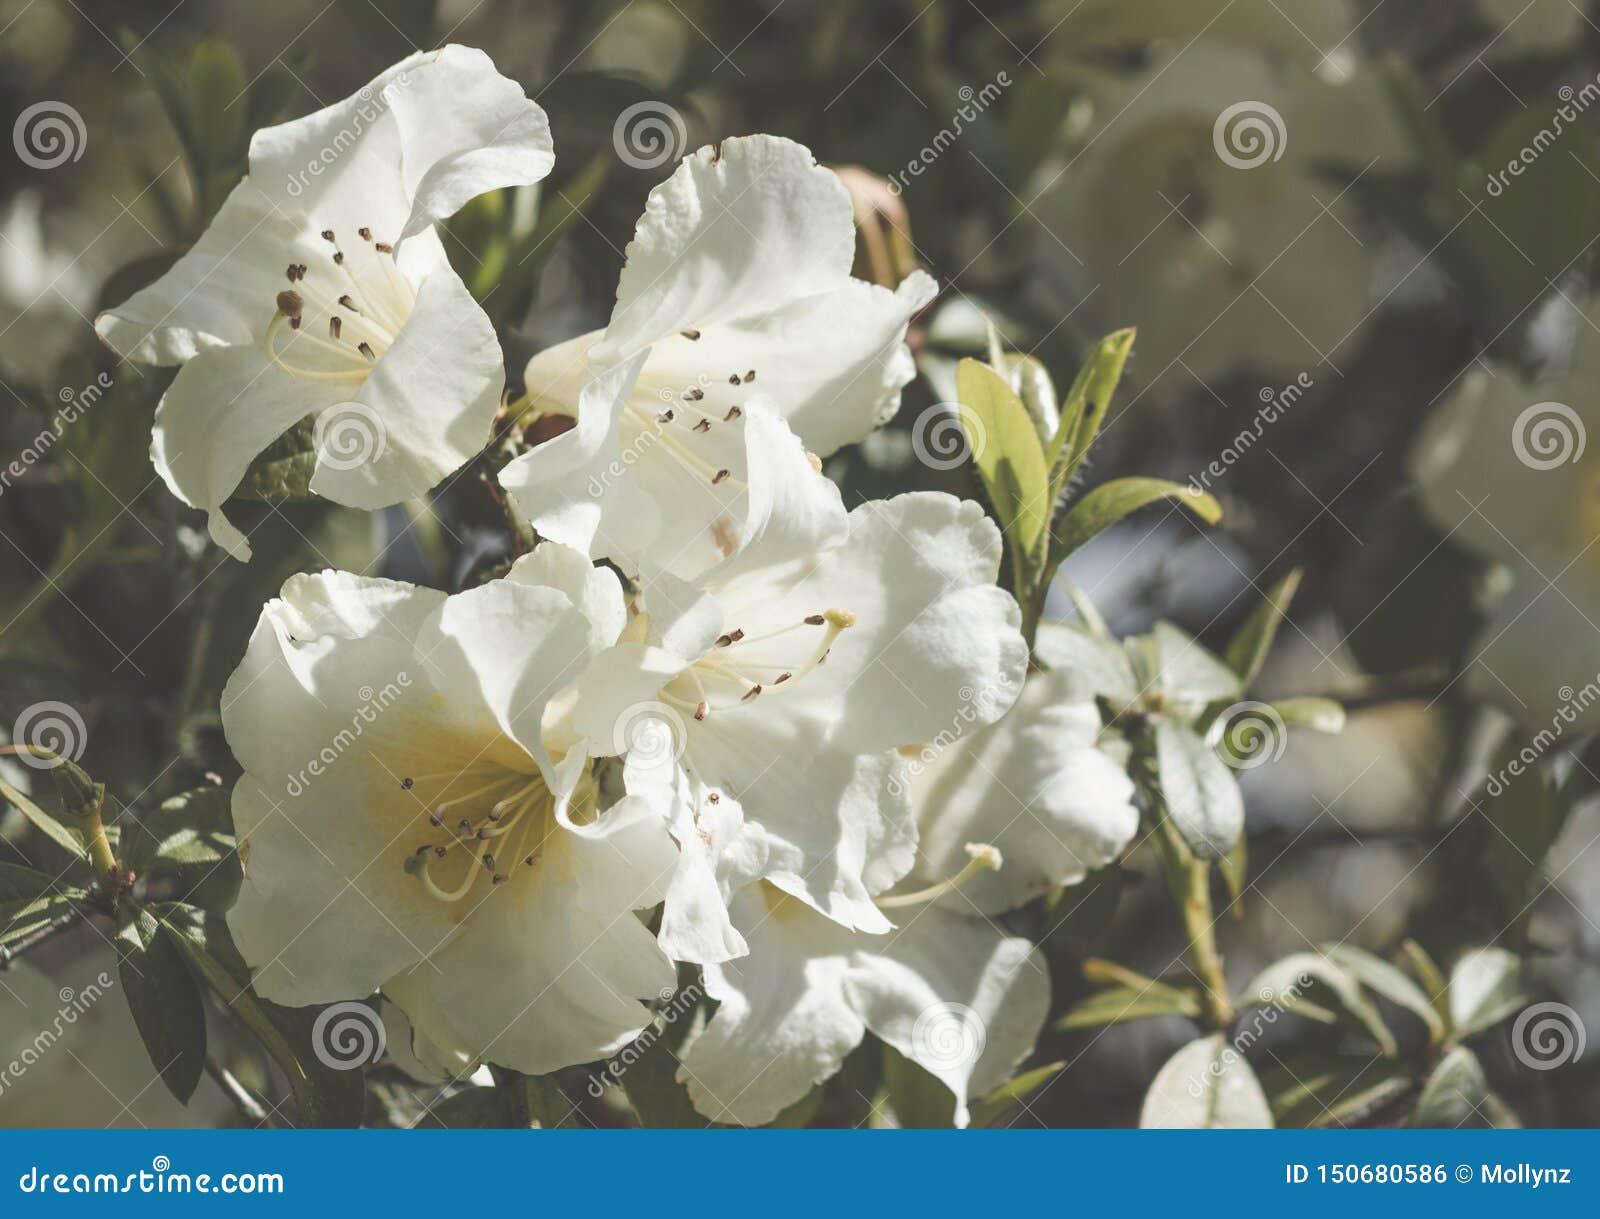 White azalea flowers